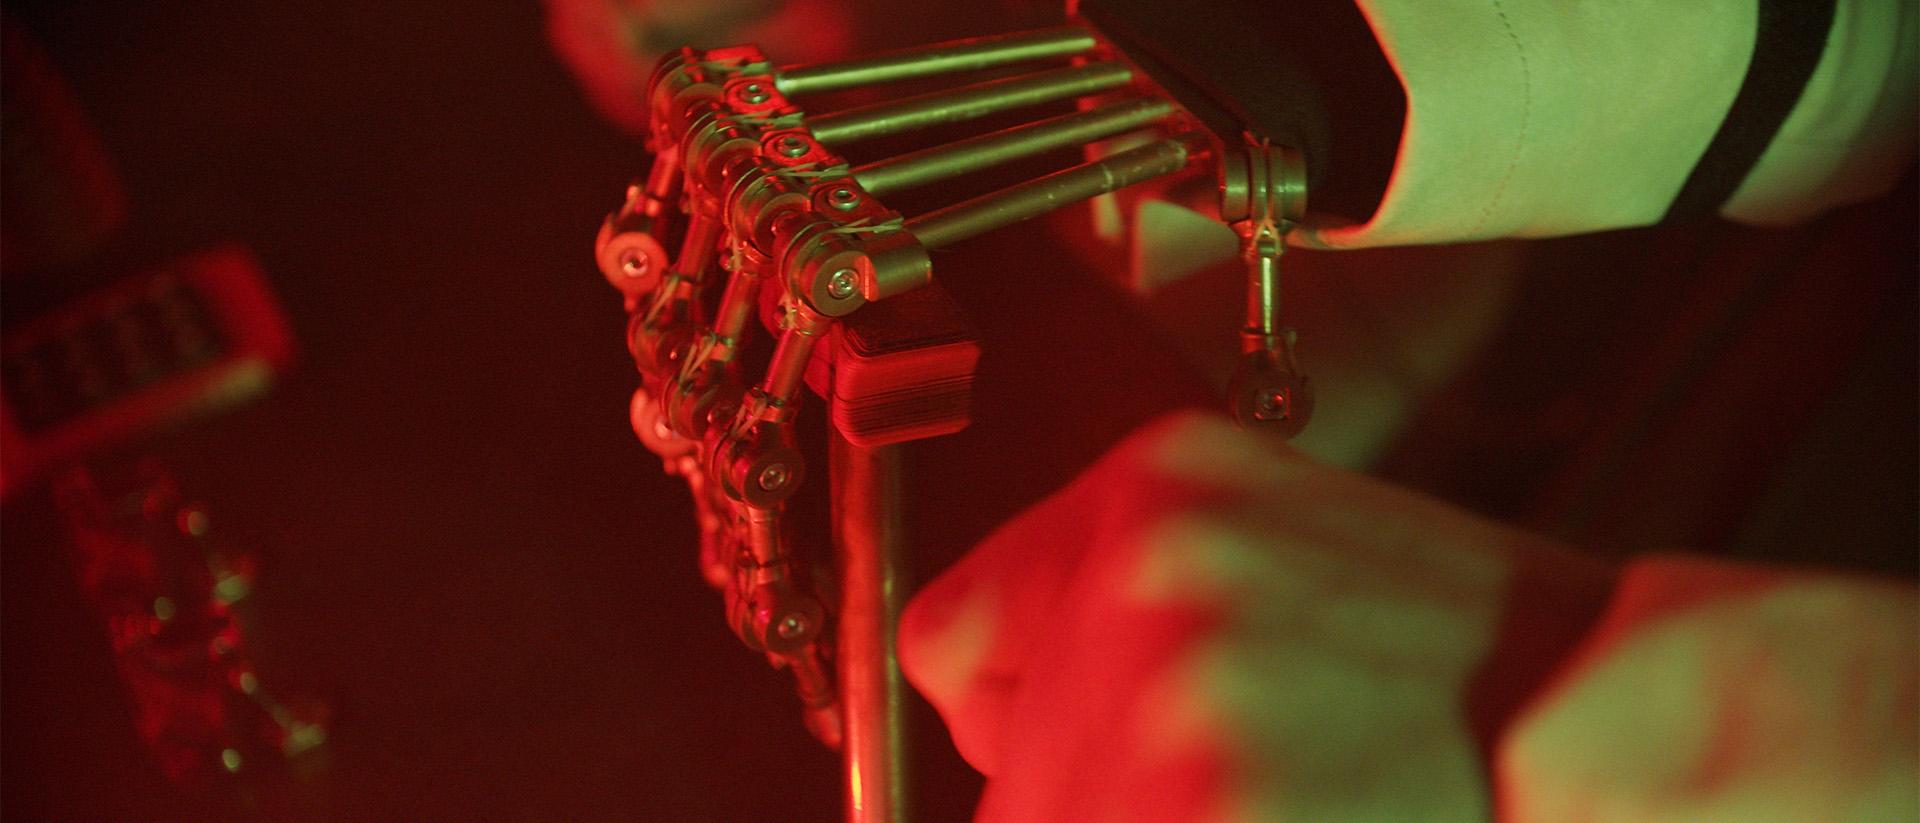 The Blaster II - robotic hand